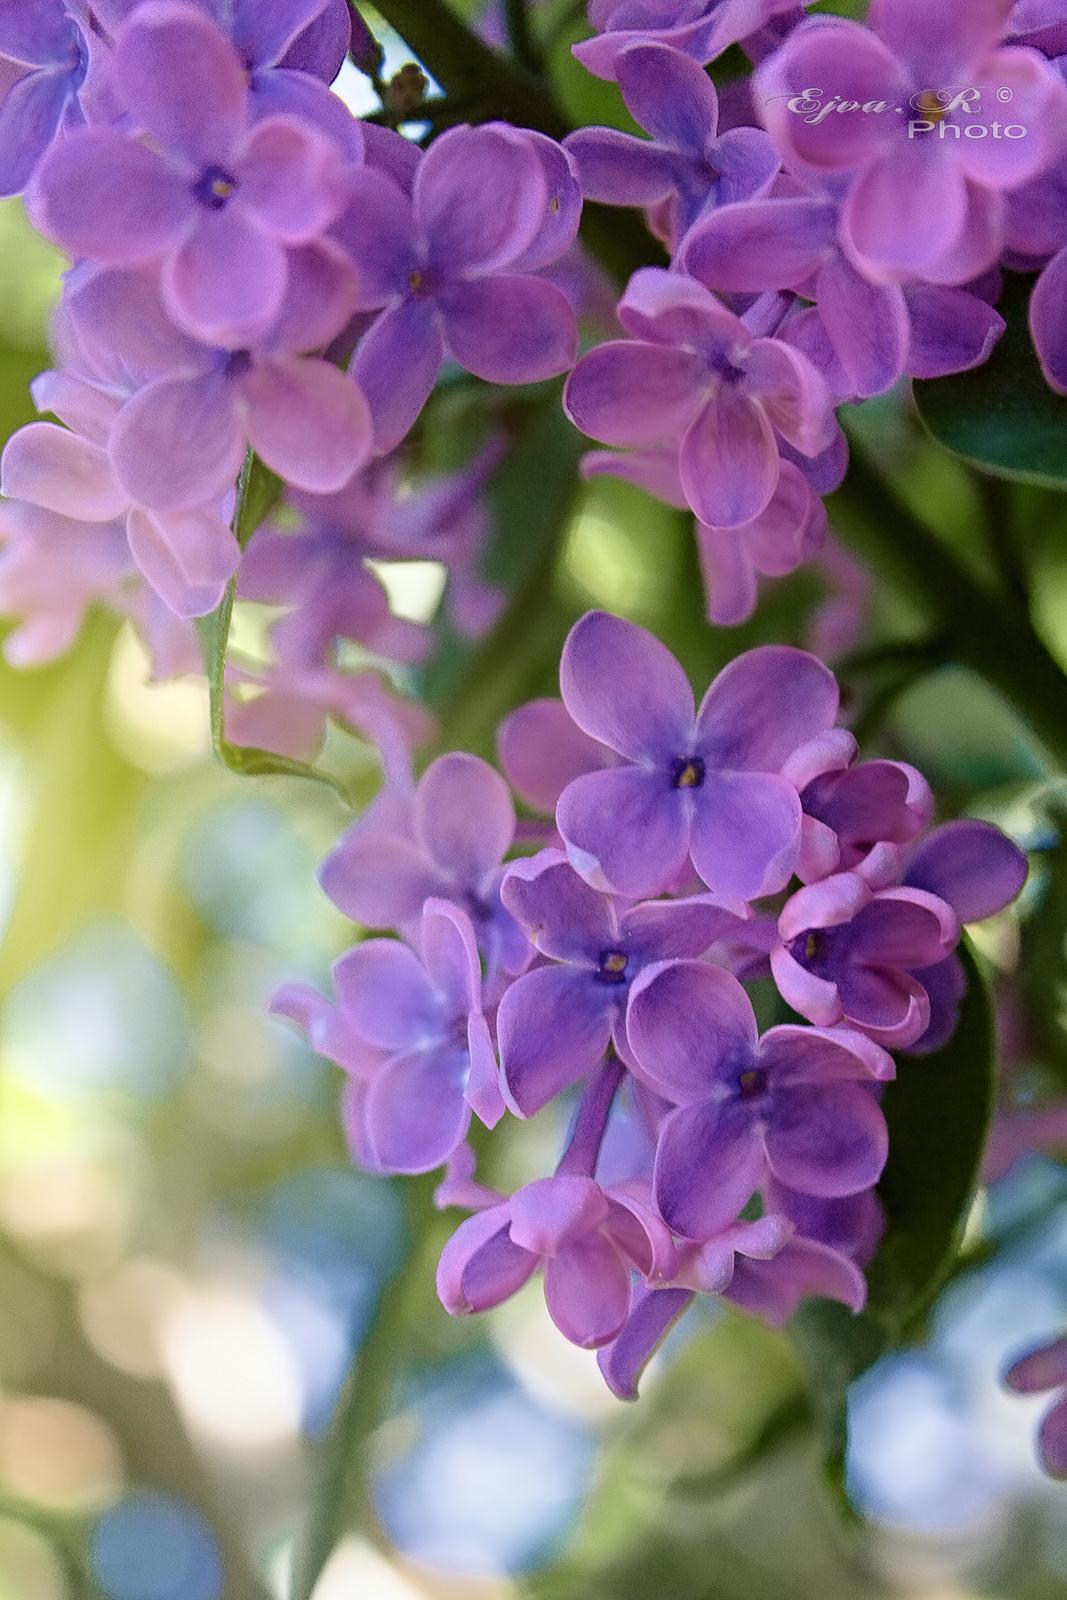 Májusi illatos orgona virágok